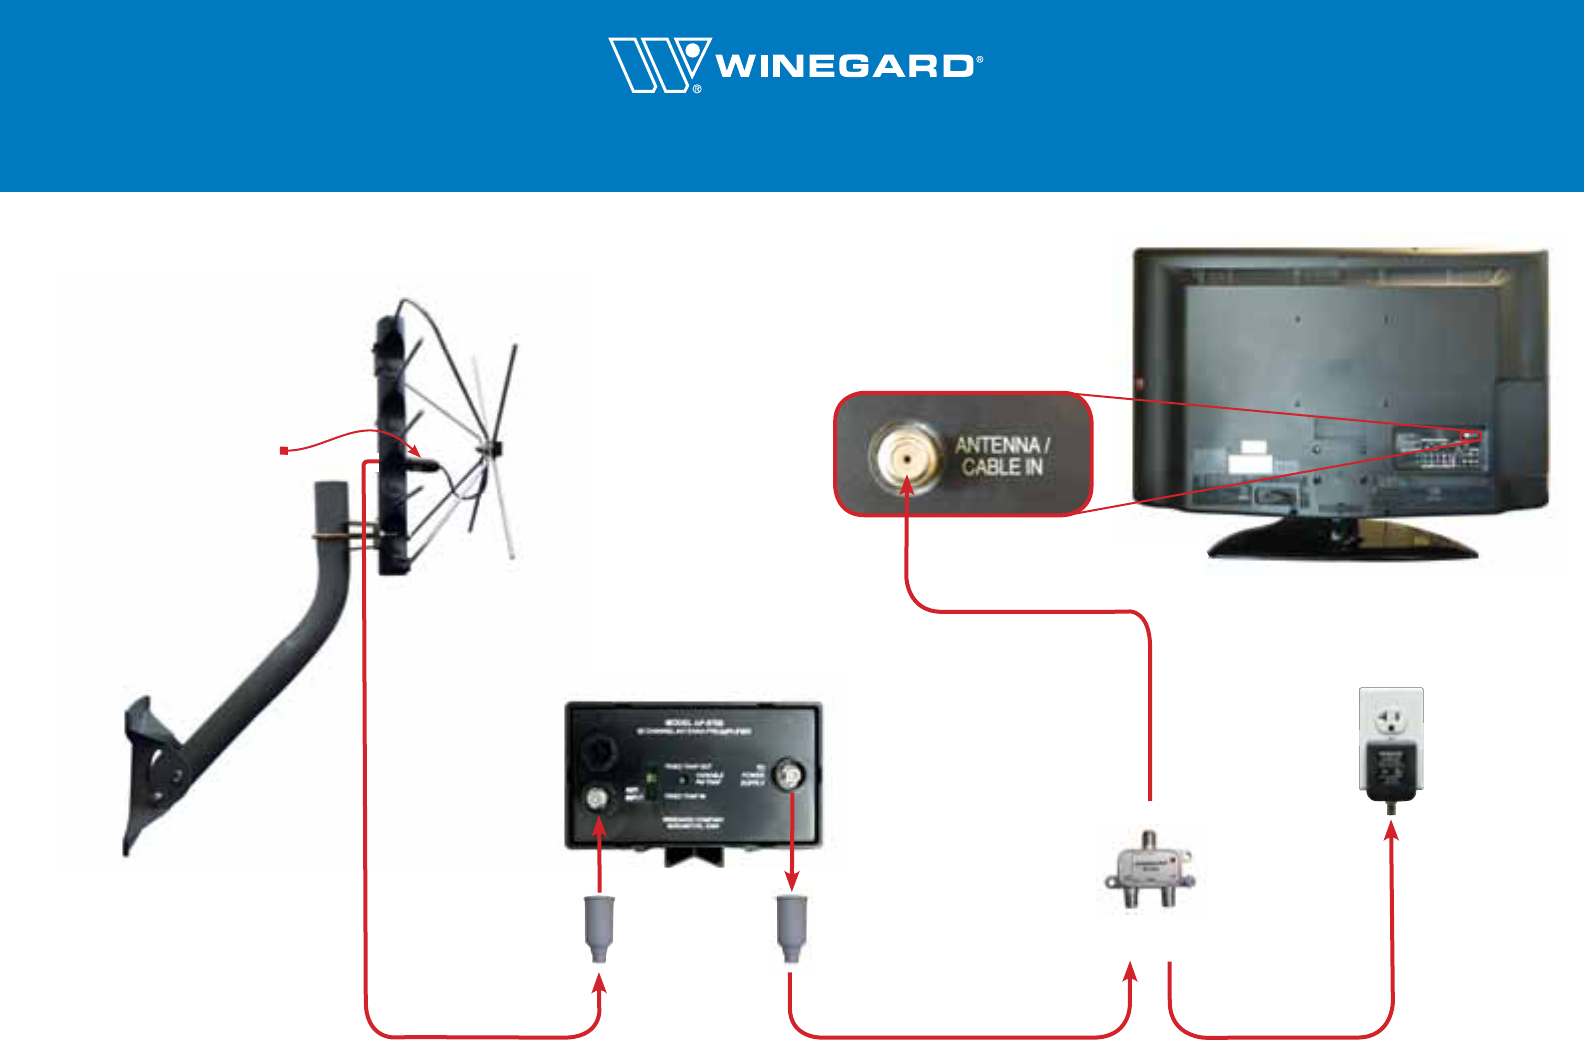 Winegard Wiring Diagrams - Wiring Diagrams Schema